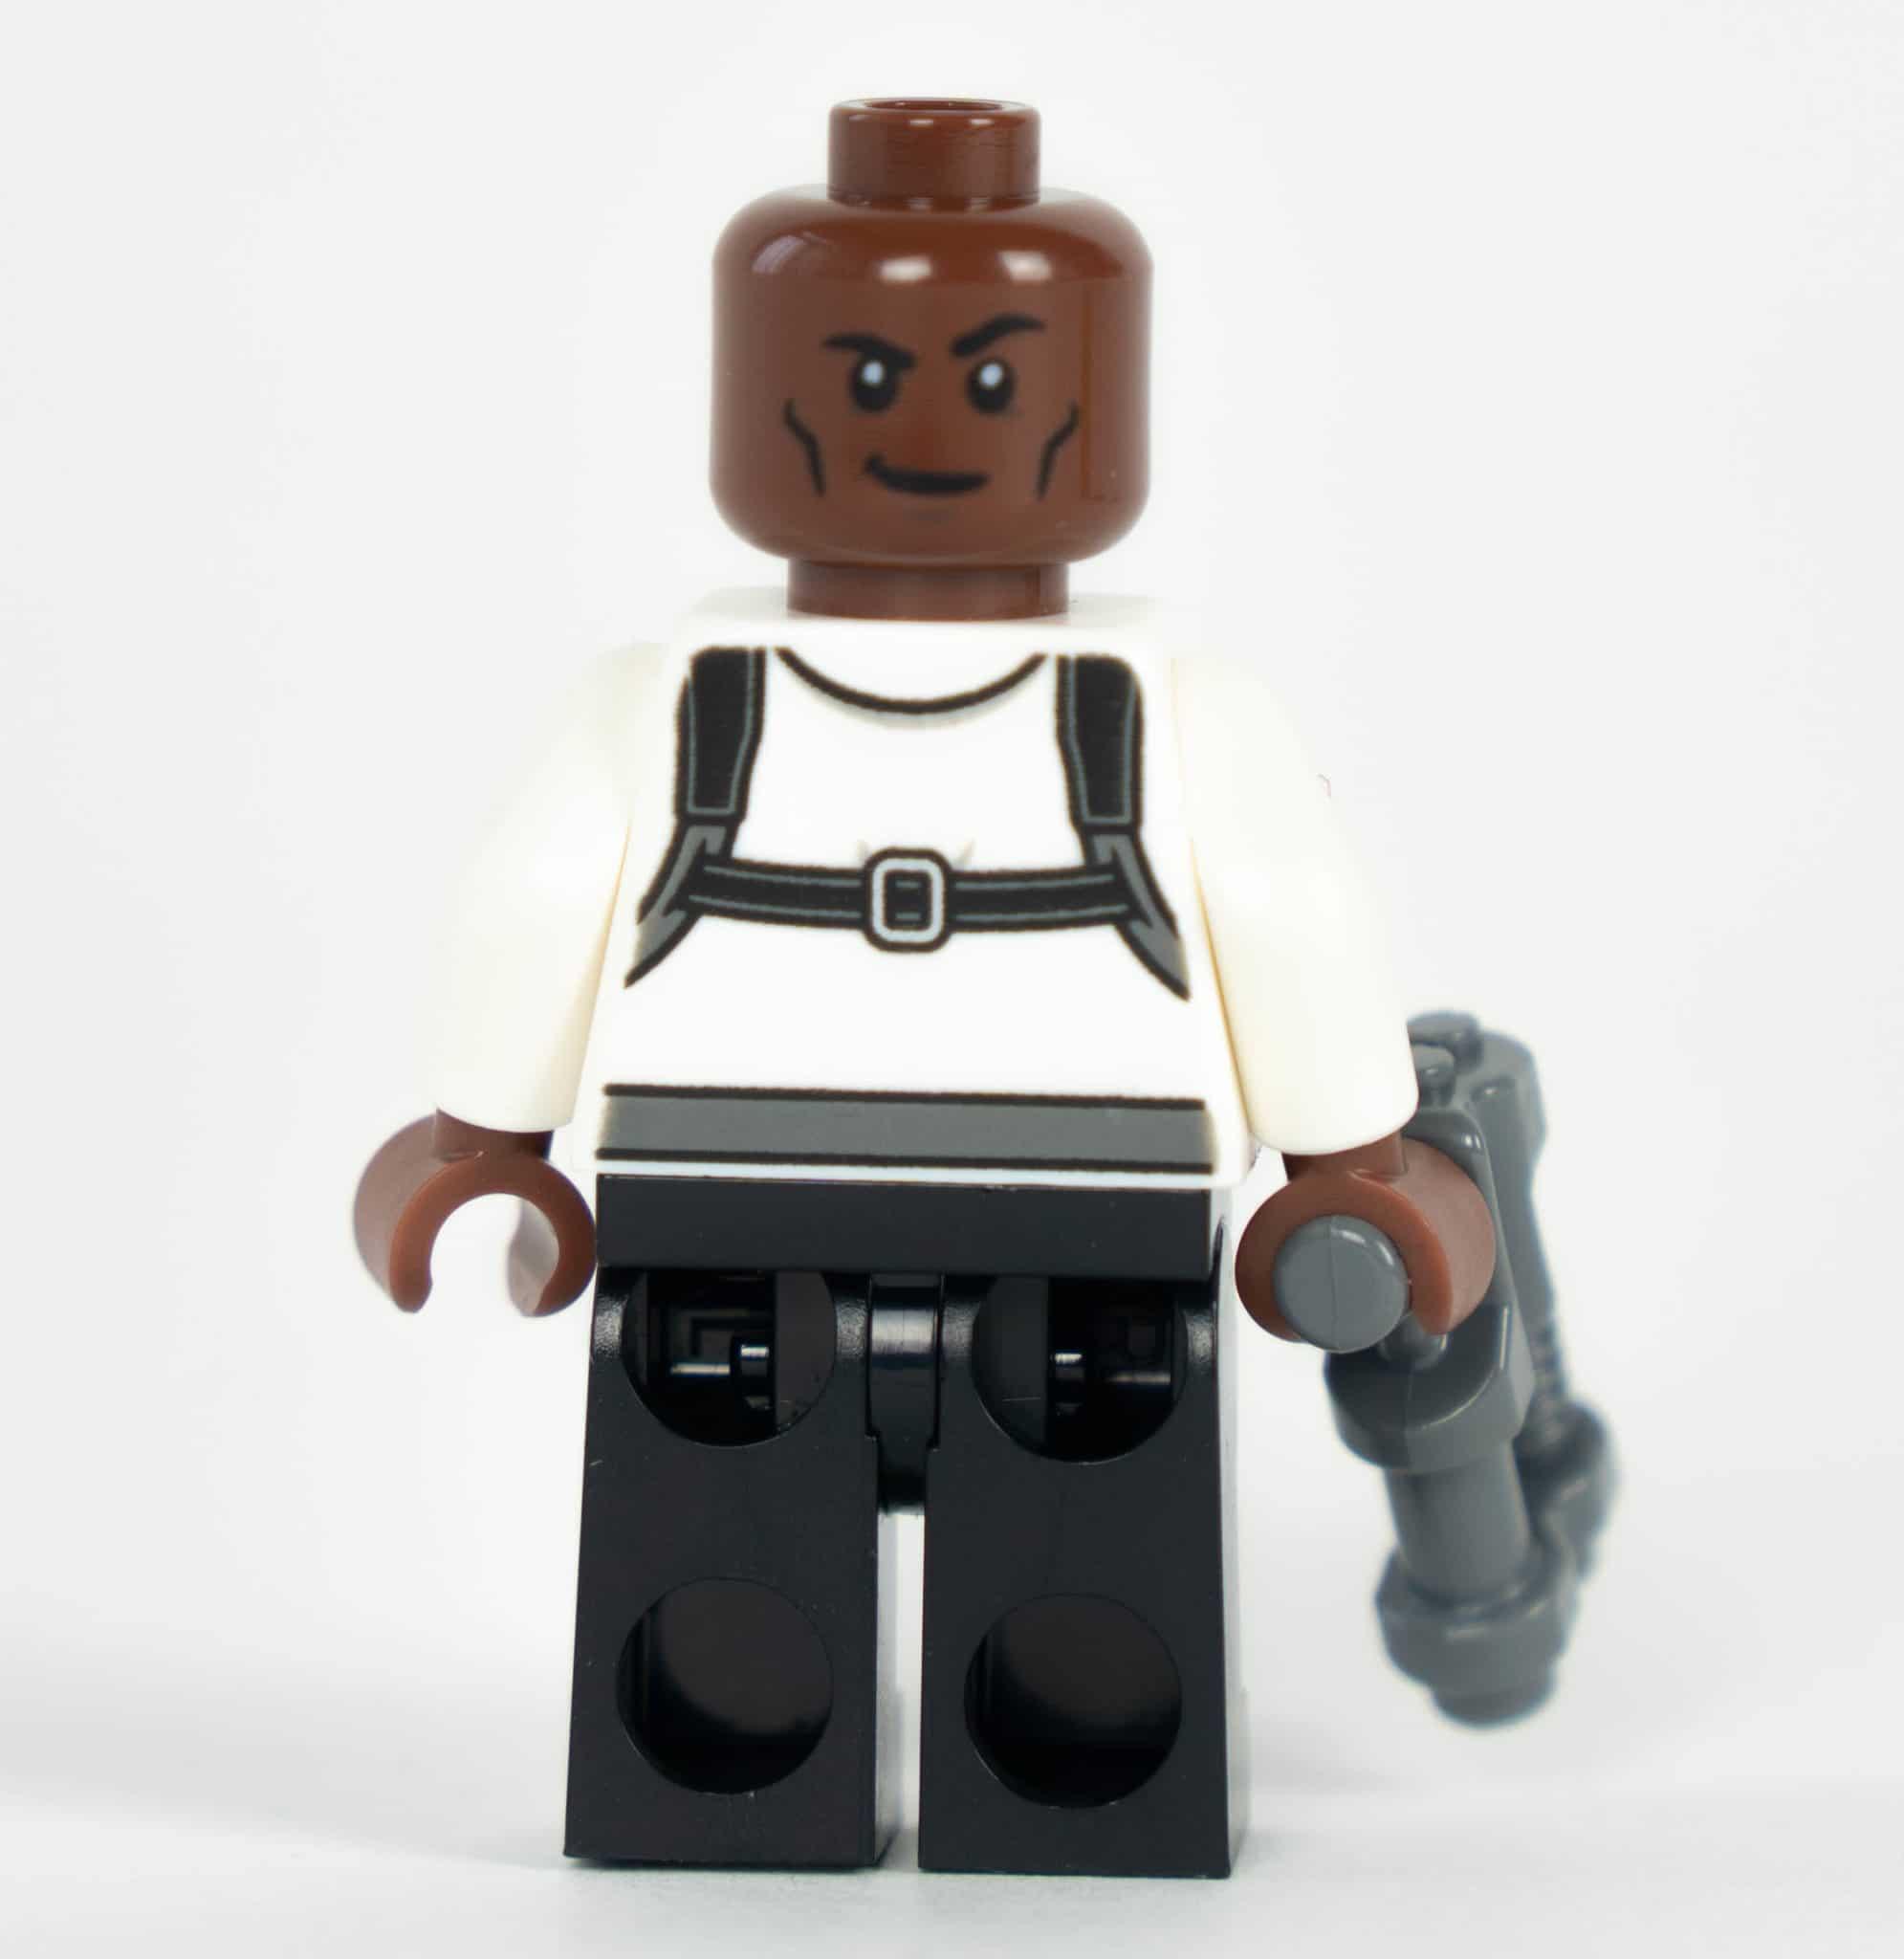 LEGO sh554 Nick Fury Minifigur